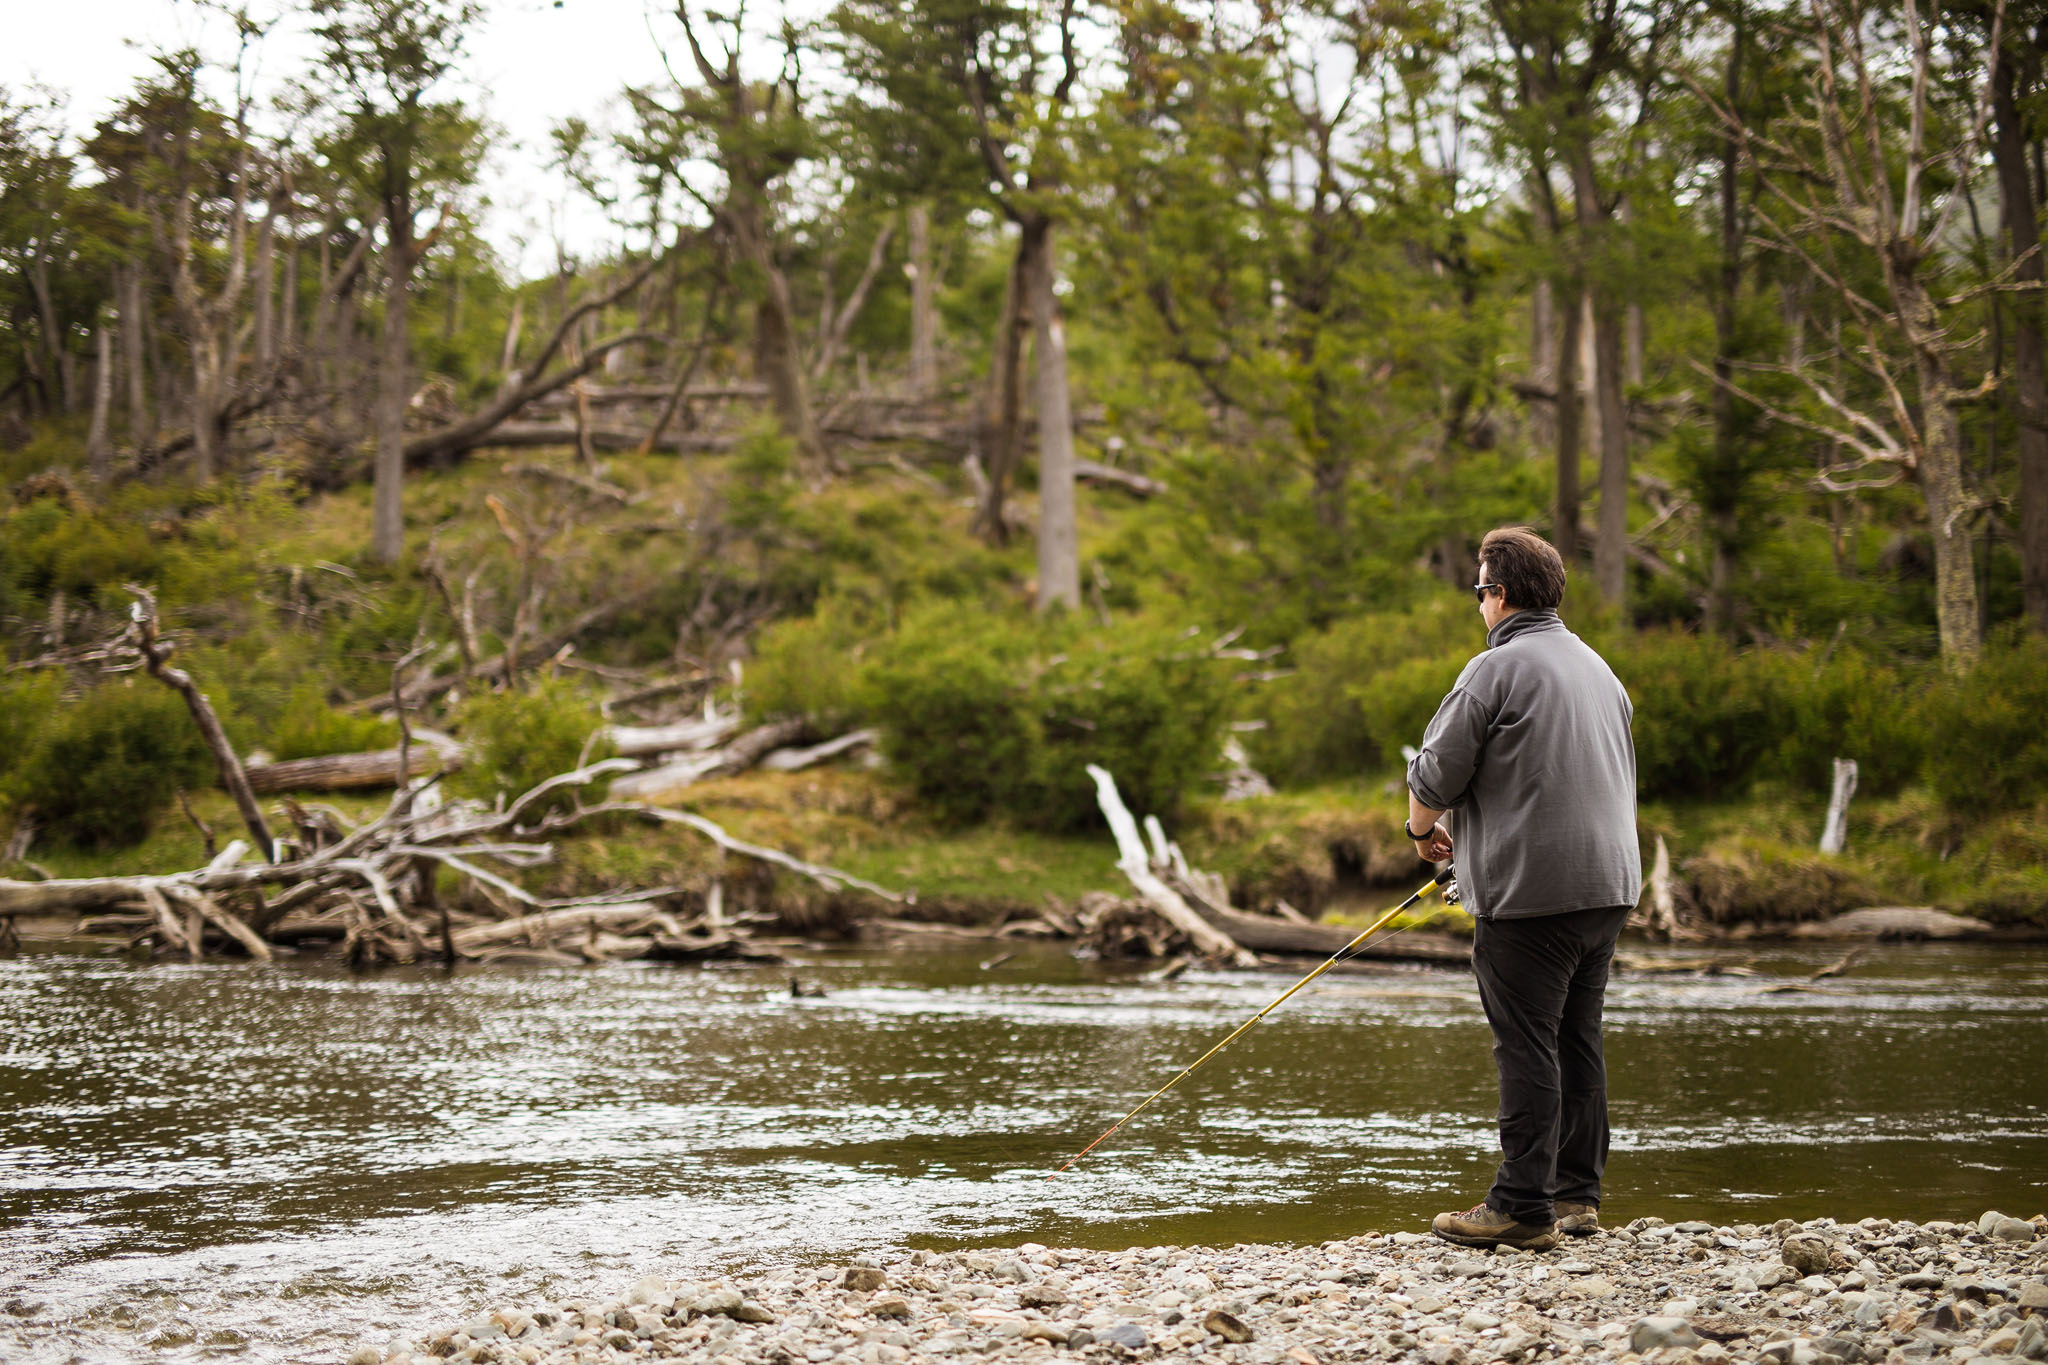 Wedding-travellers-ushuaia-argentina-fishing-argentina-tiera-del-fuego